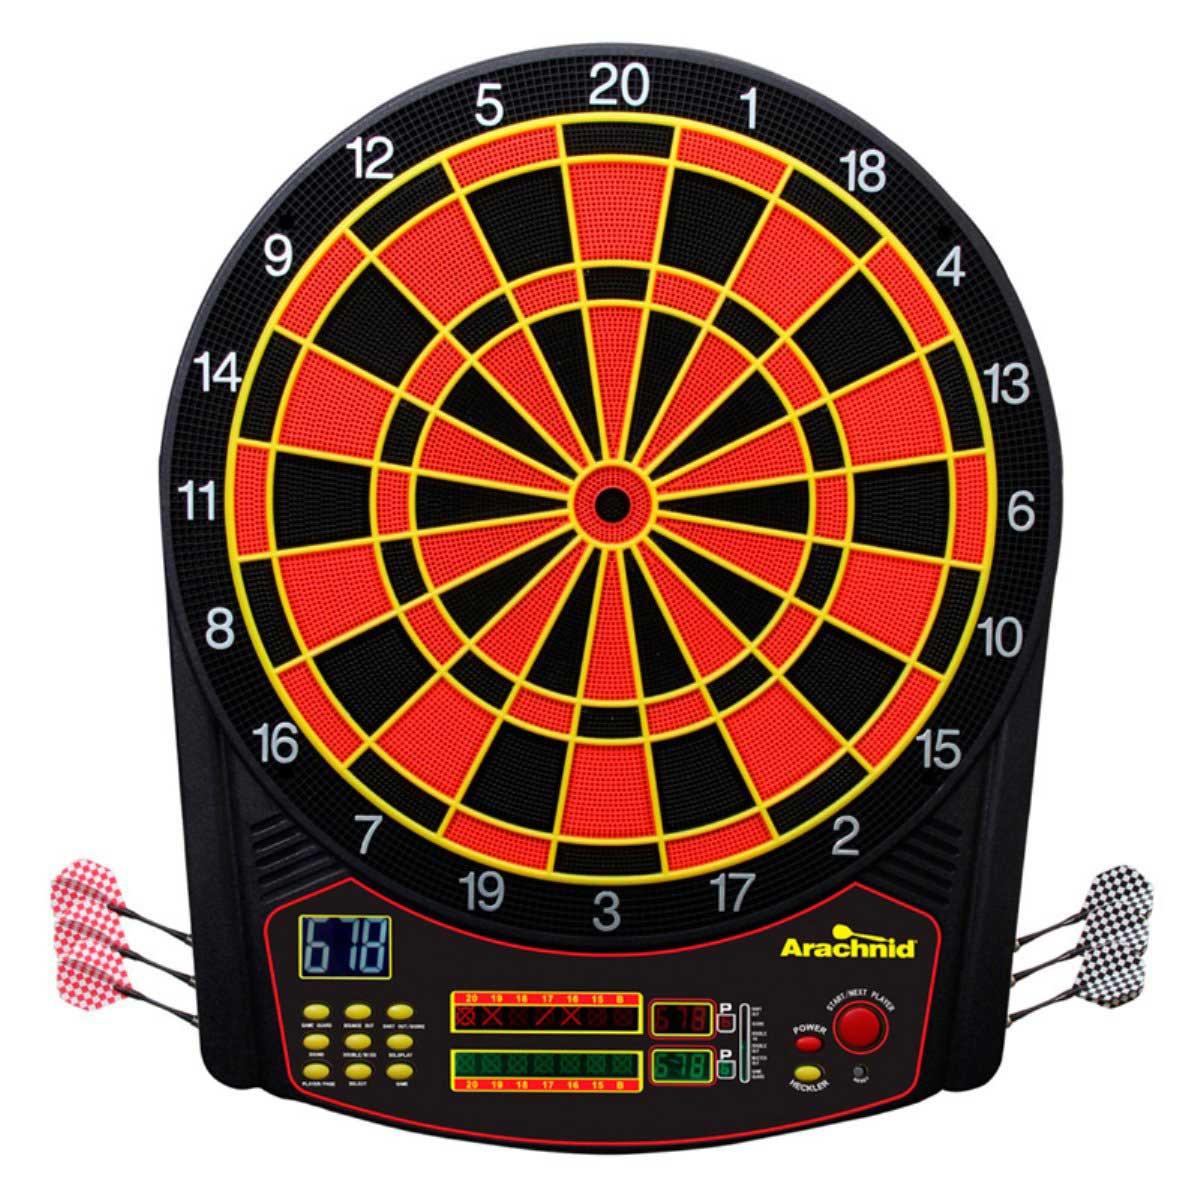 Arachnid CricketPro 450 Electronic Dart Board